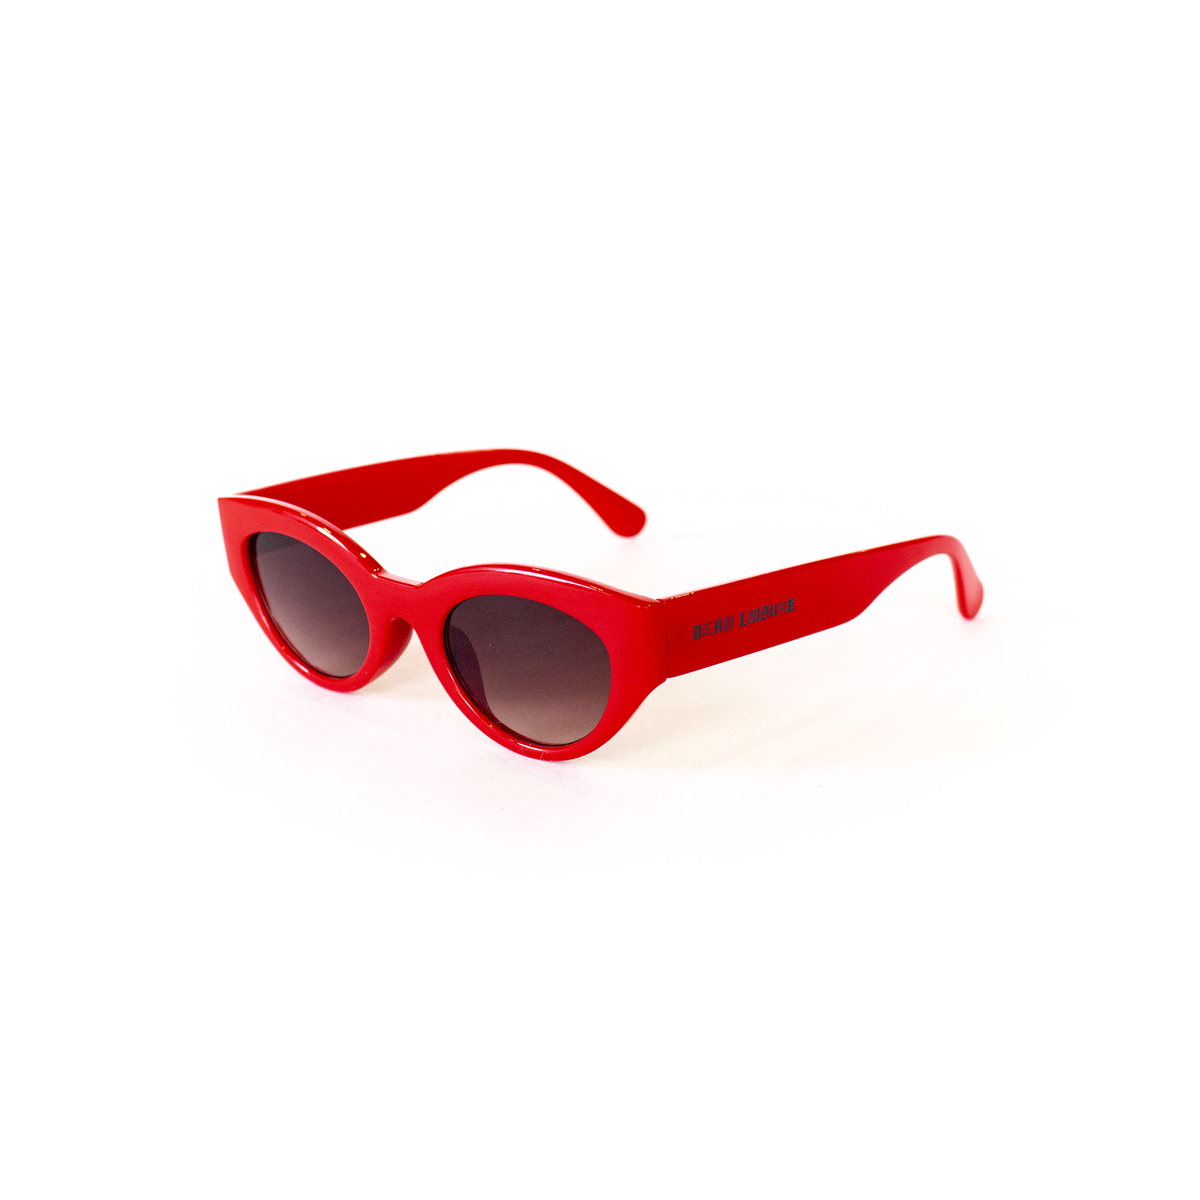 Blinkers Sunglasses - Red